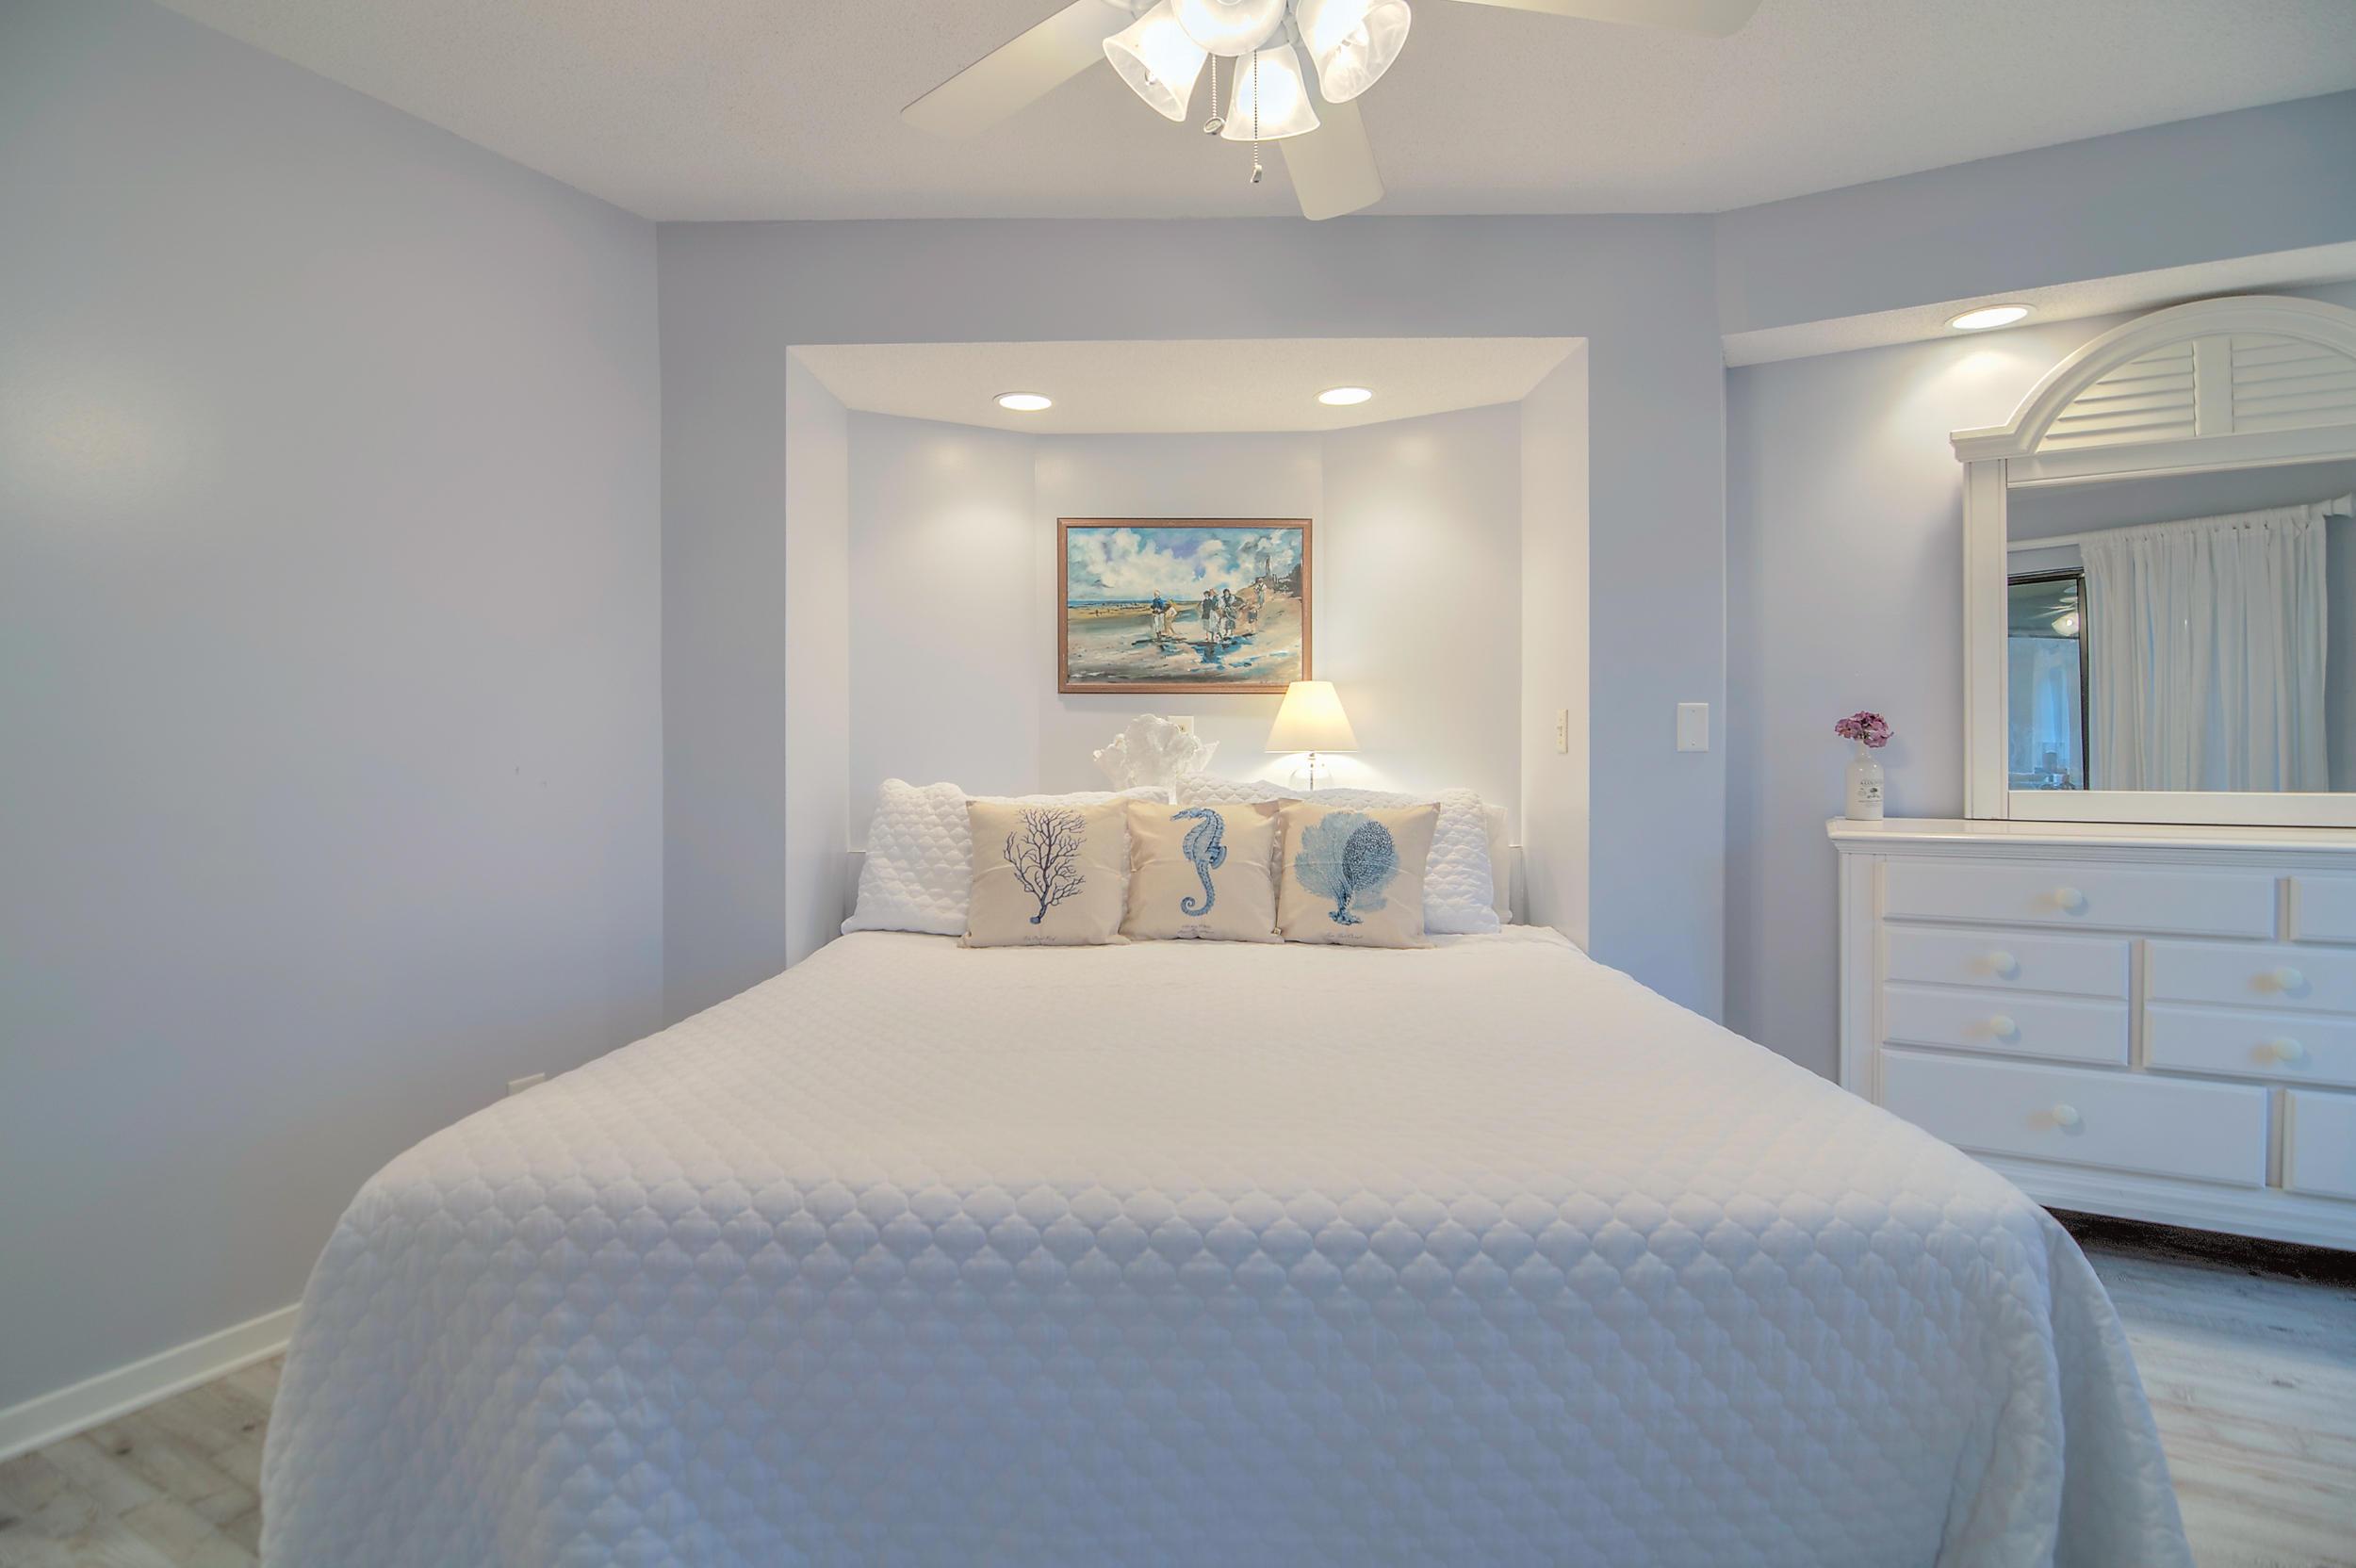 Port Ocall Homes For Sale - 103 Port O Call, Isle of Palms, SC - 2